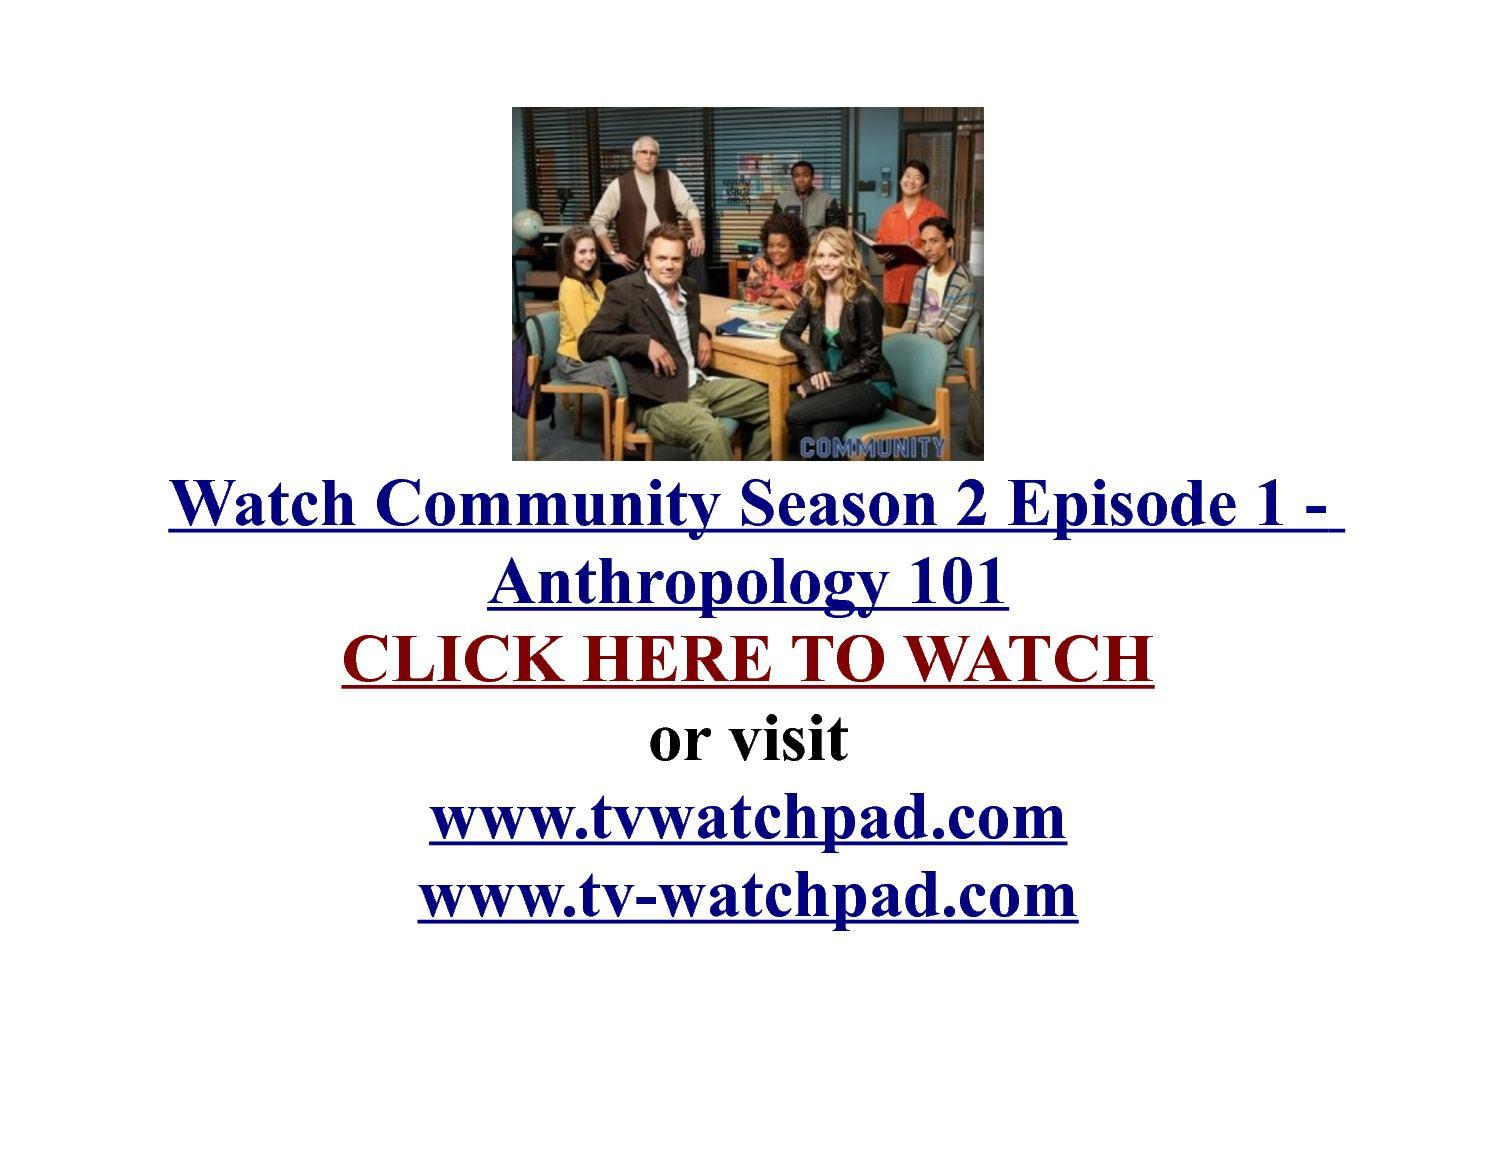 Calaméo - Watch Community Season 2 Episode 1 - Anthropology 101